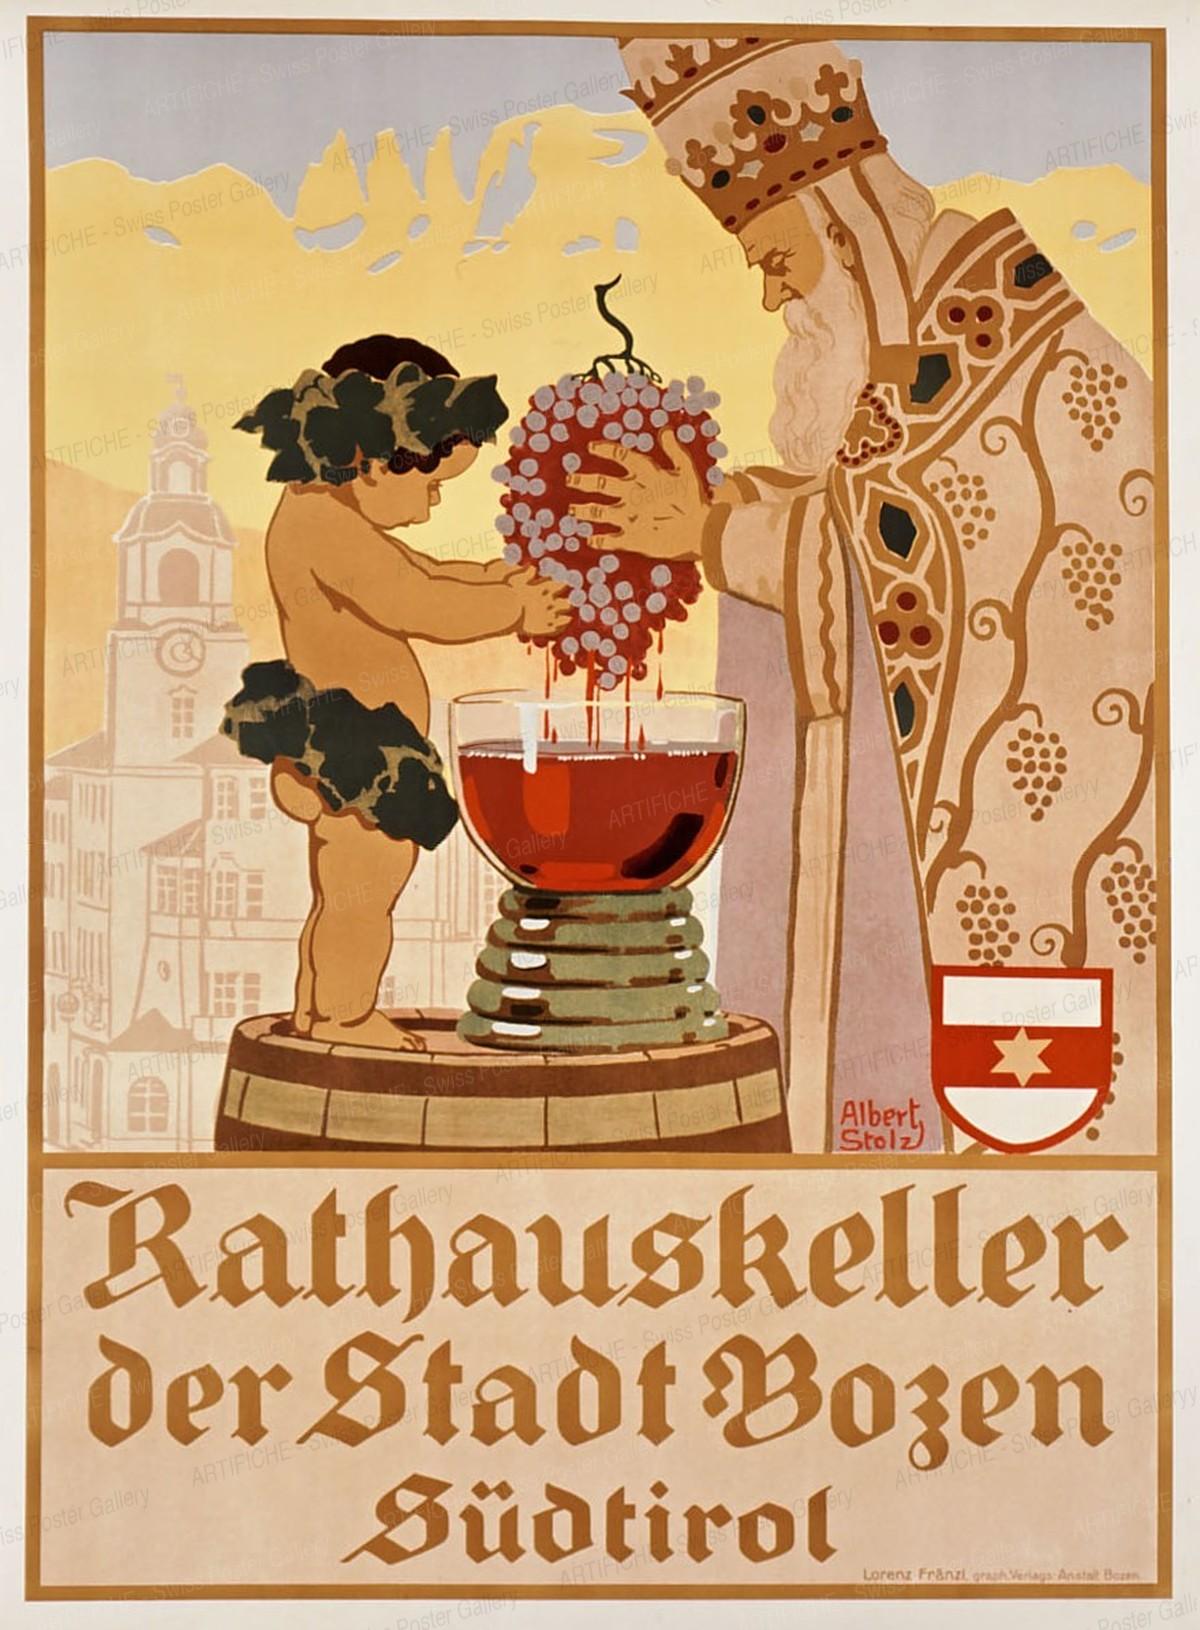 Rathauskeller der Stadt Bozen – Südtirol, Albert Stolz